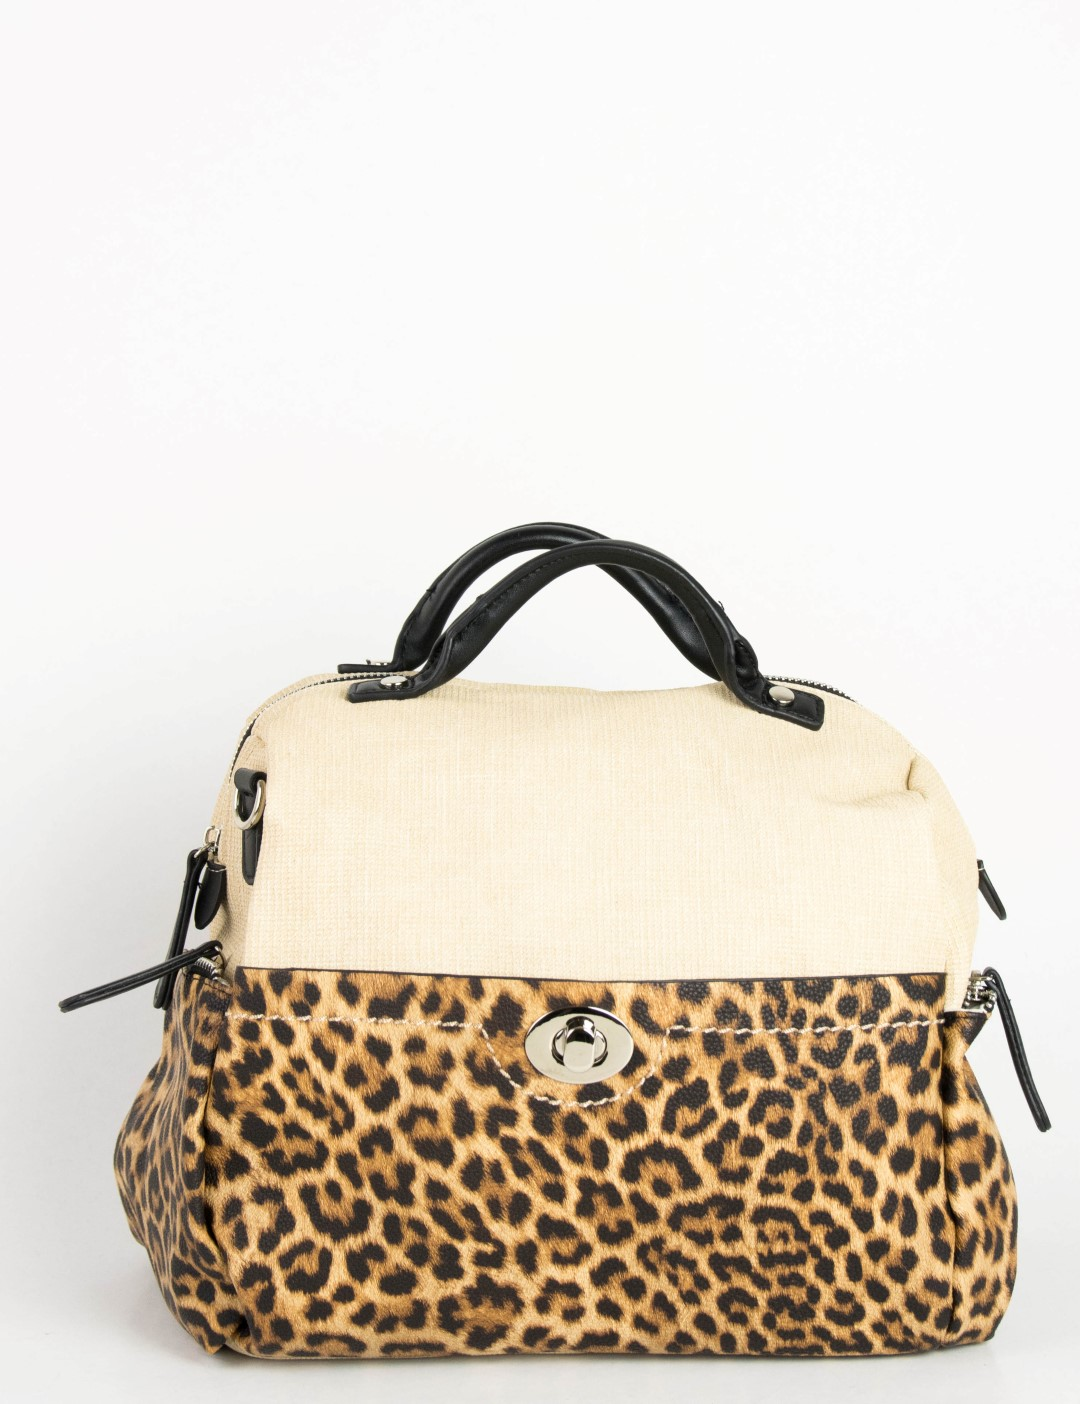 3867689ad2 Γυναικεία λεοπάρ τσάντα ώμου μπεζ υφασμάτινη CFC7123G